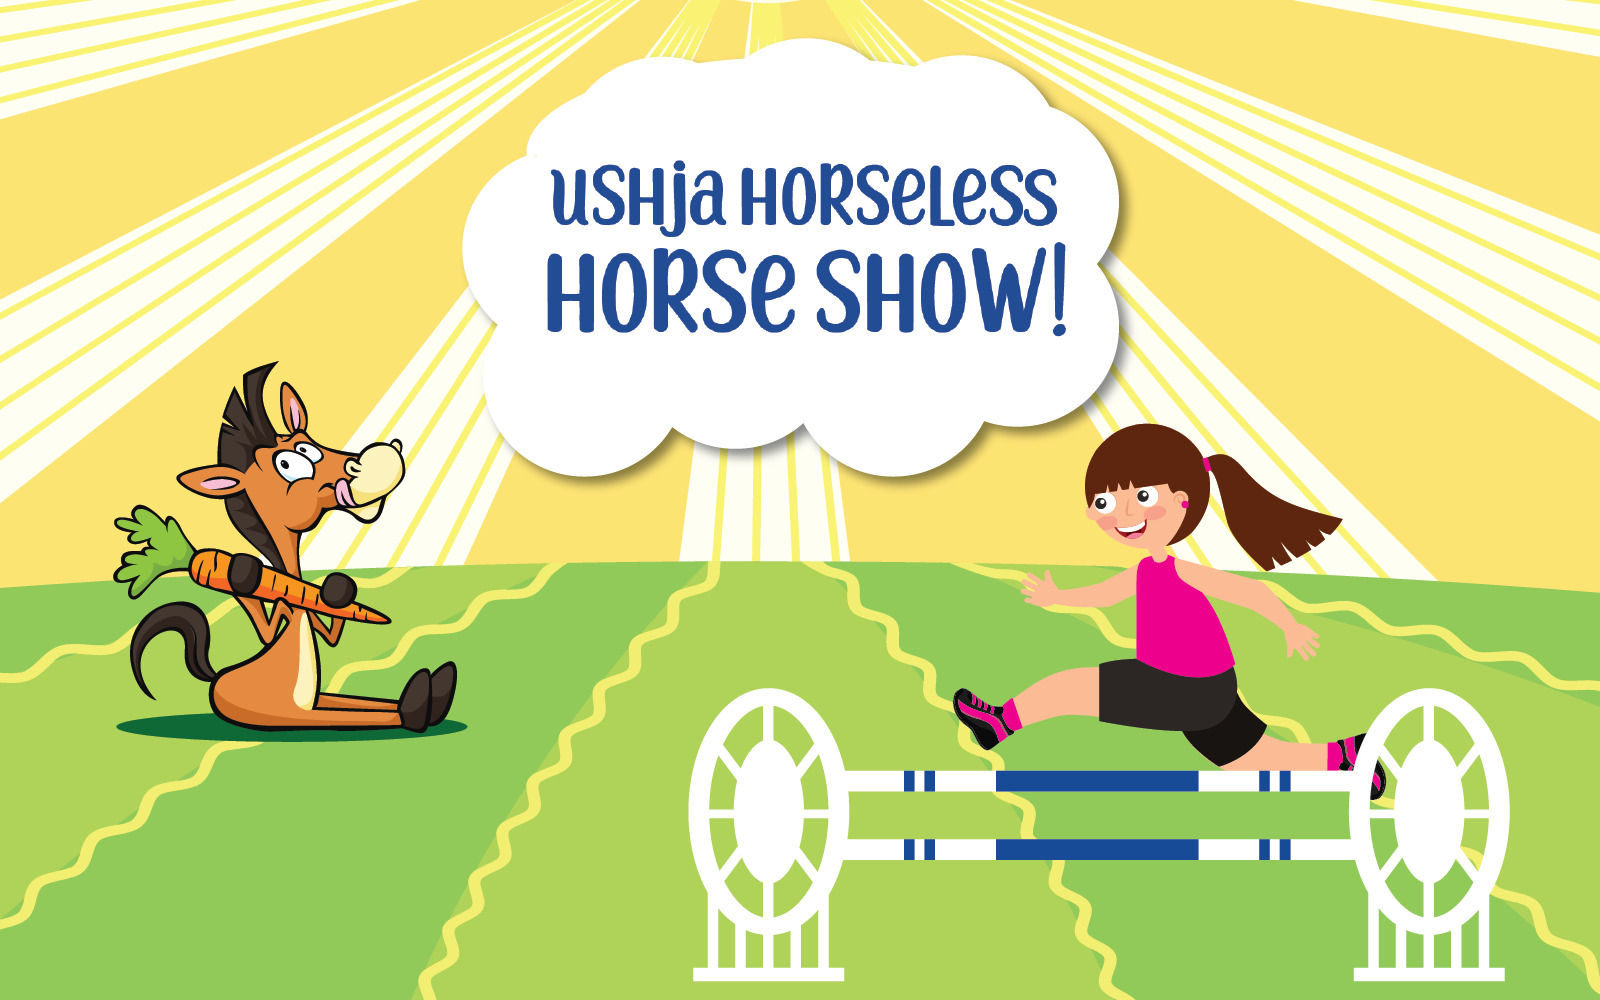 USHJA Horseless Horse Show Fundraiser at EQUITANA USA image